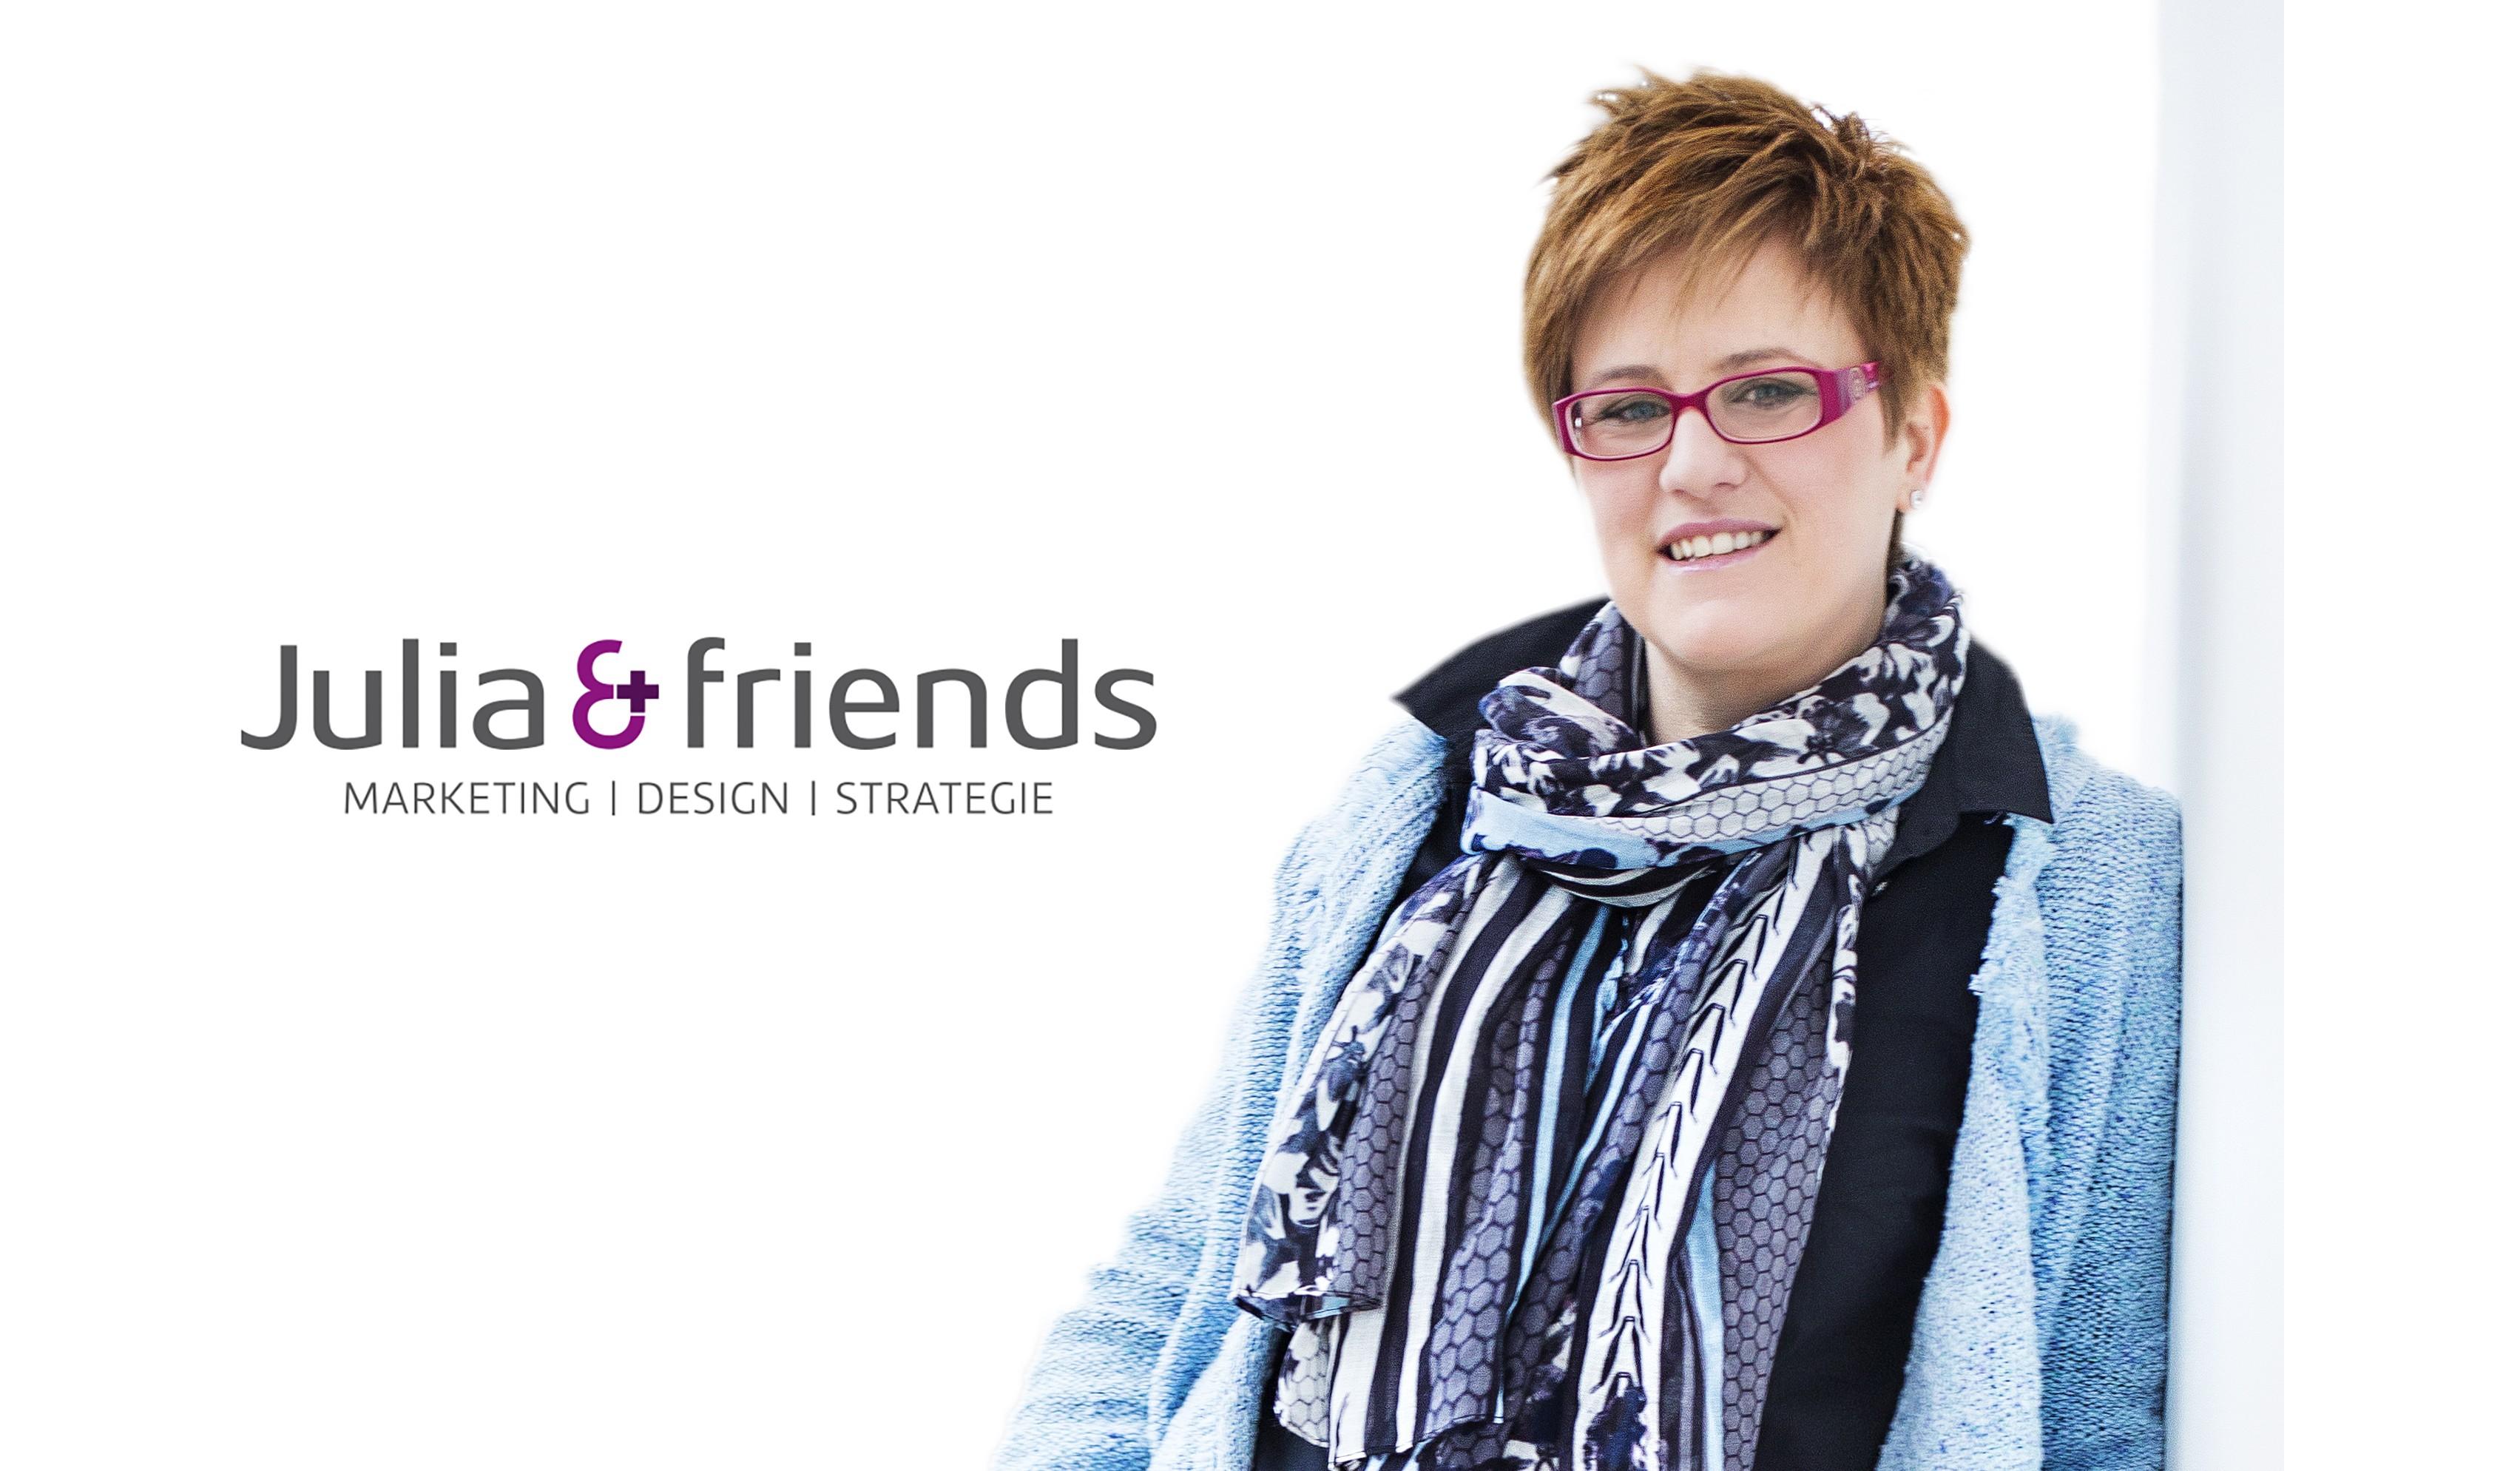 Julia&friends: Η ελληνική εταιρεία για τα πρώτα σας ΕΠΑΓΓΕΛΜΑΤΙΚΑ βήματα στη Γερμανία